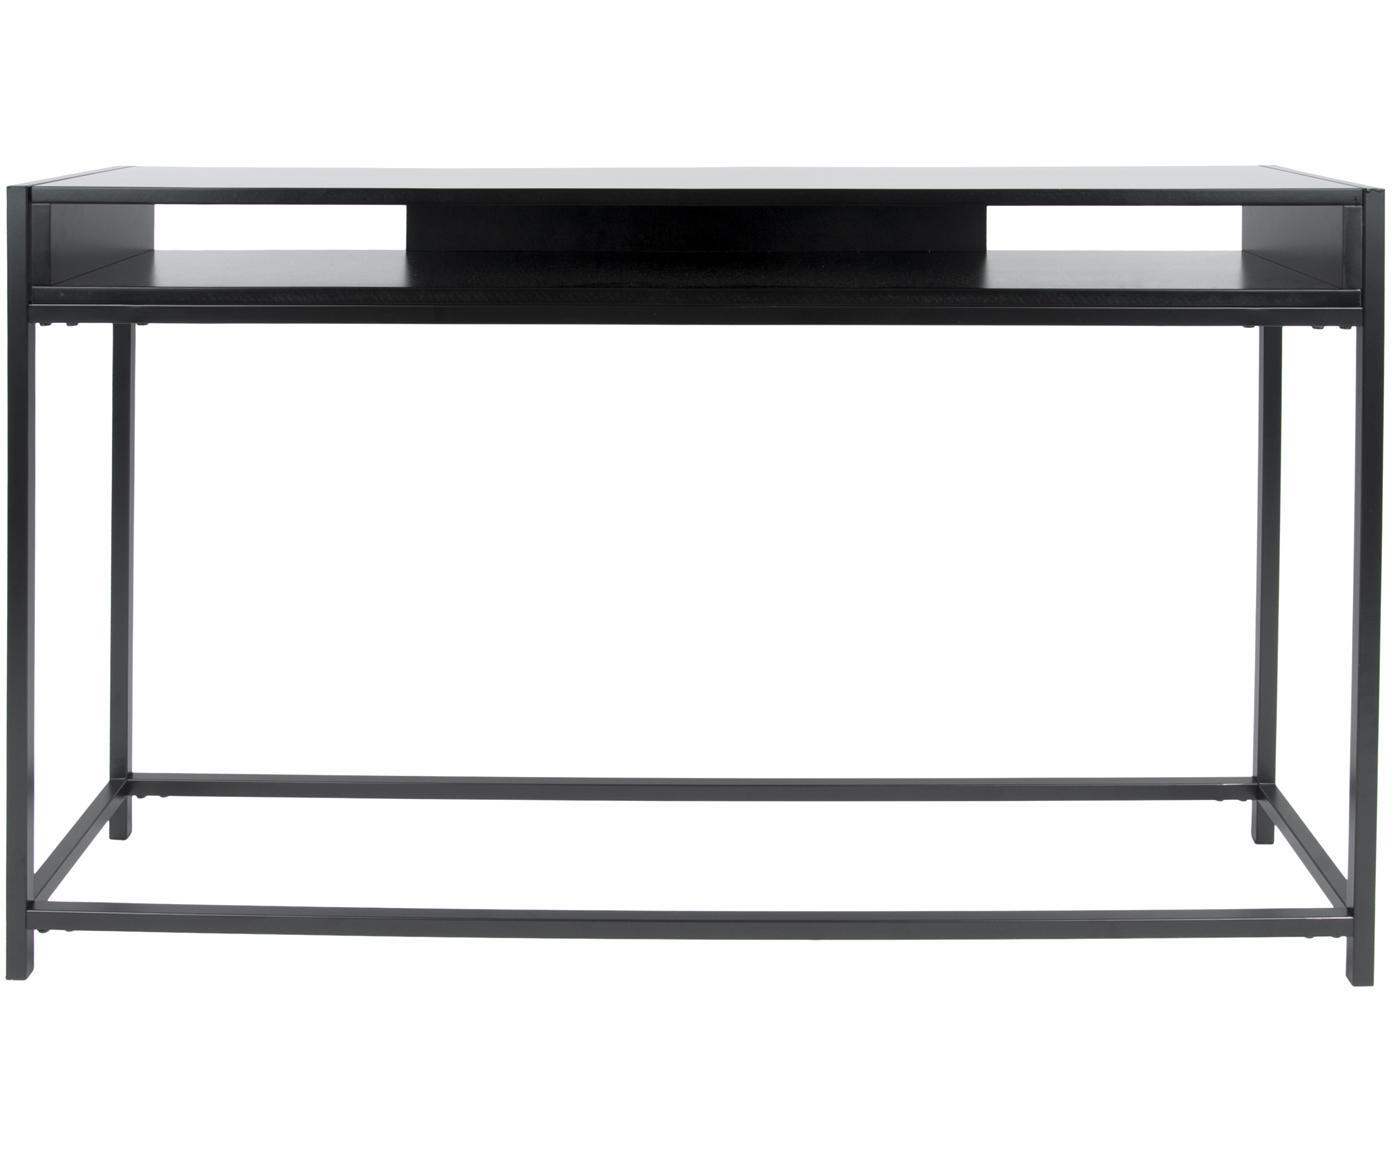 Consola Fushion, Estructura: metal, pintura en polvo, Estante: tablero de fibras de dens, Negro, An 122 x Al 81 cm